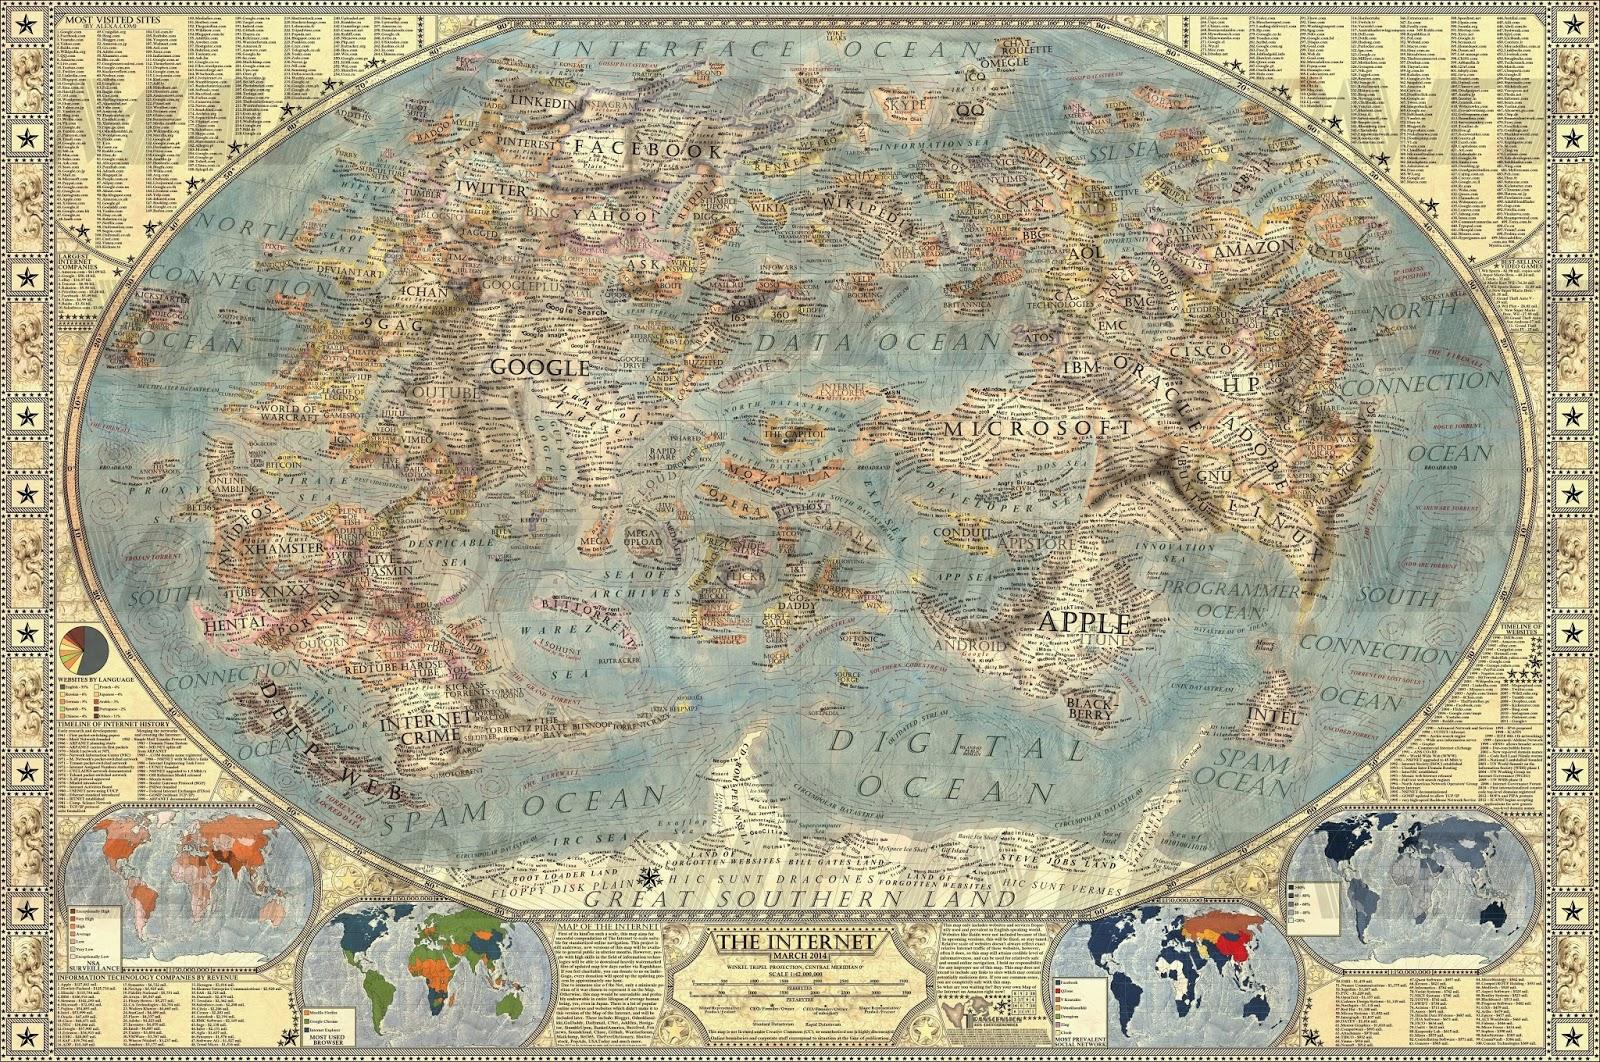 Mapa de Internet de Martin Vargic